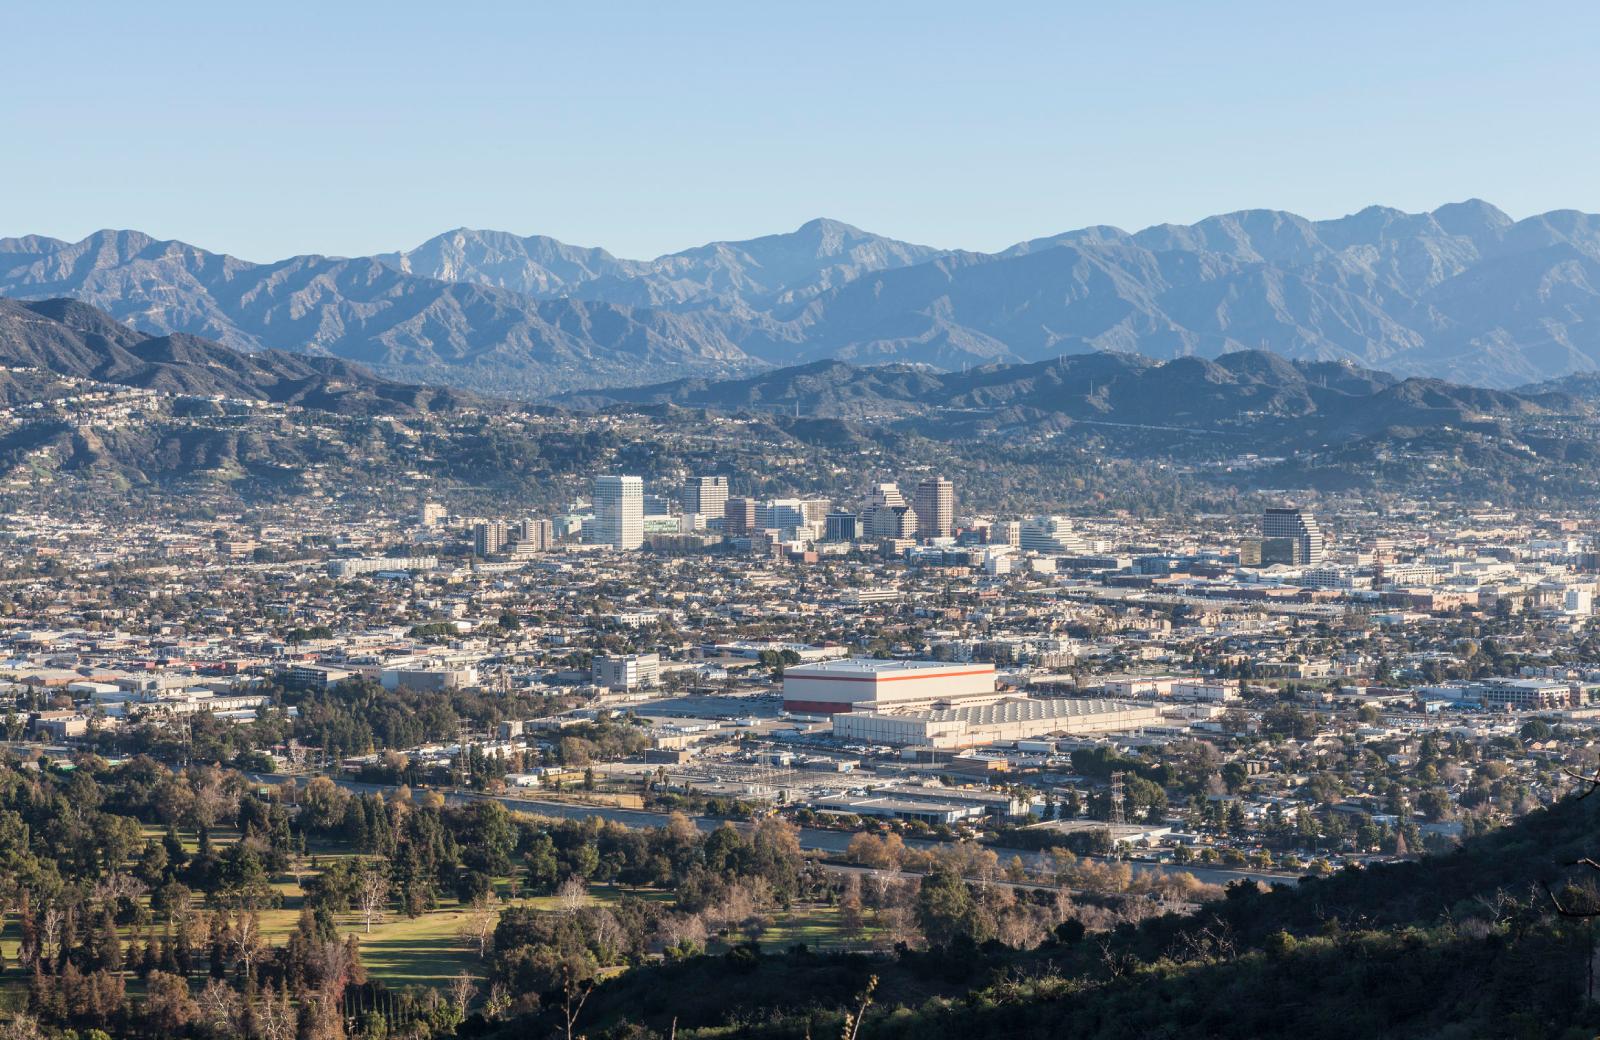 Downtown Glendale - Altana Apts